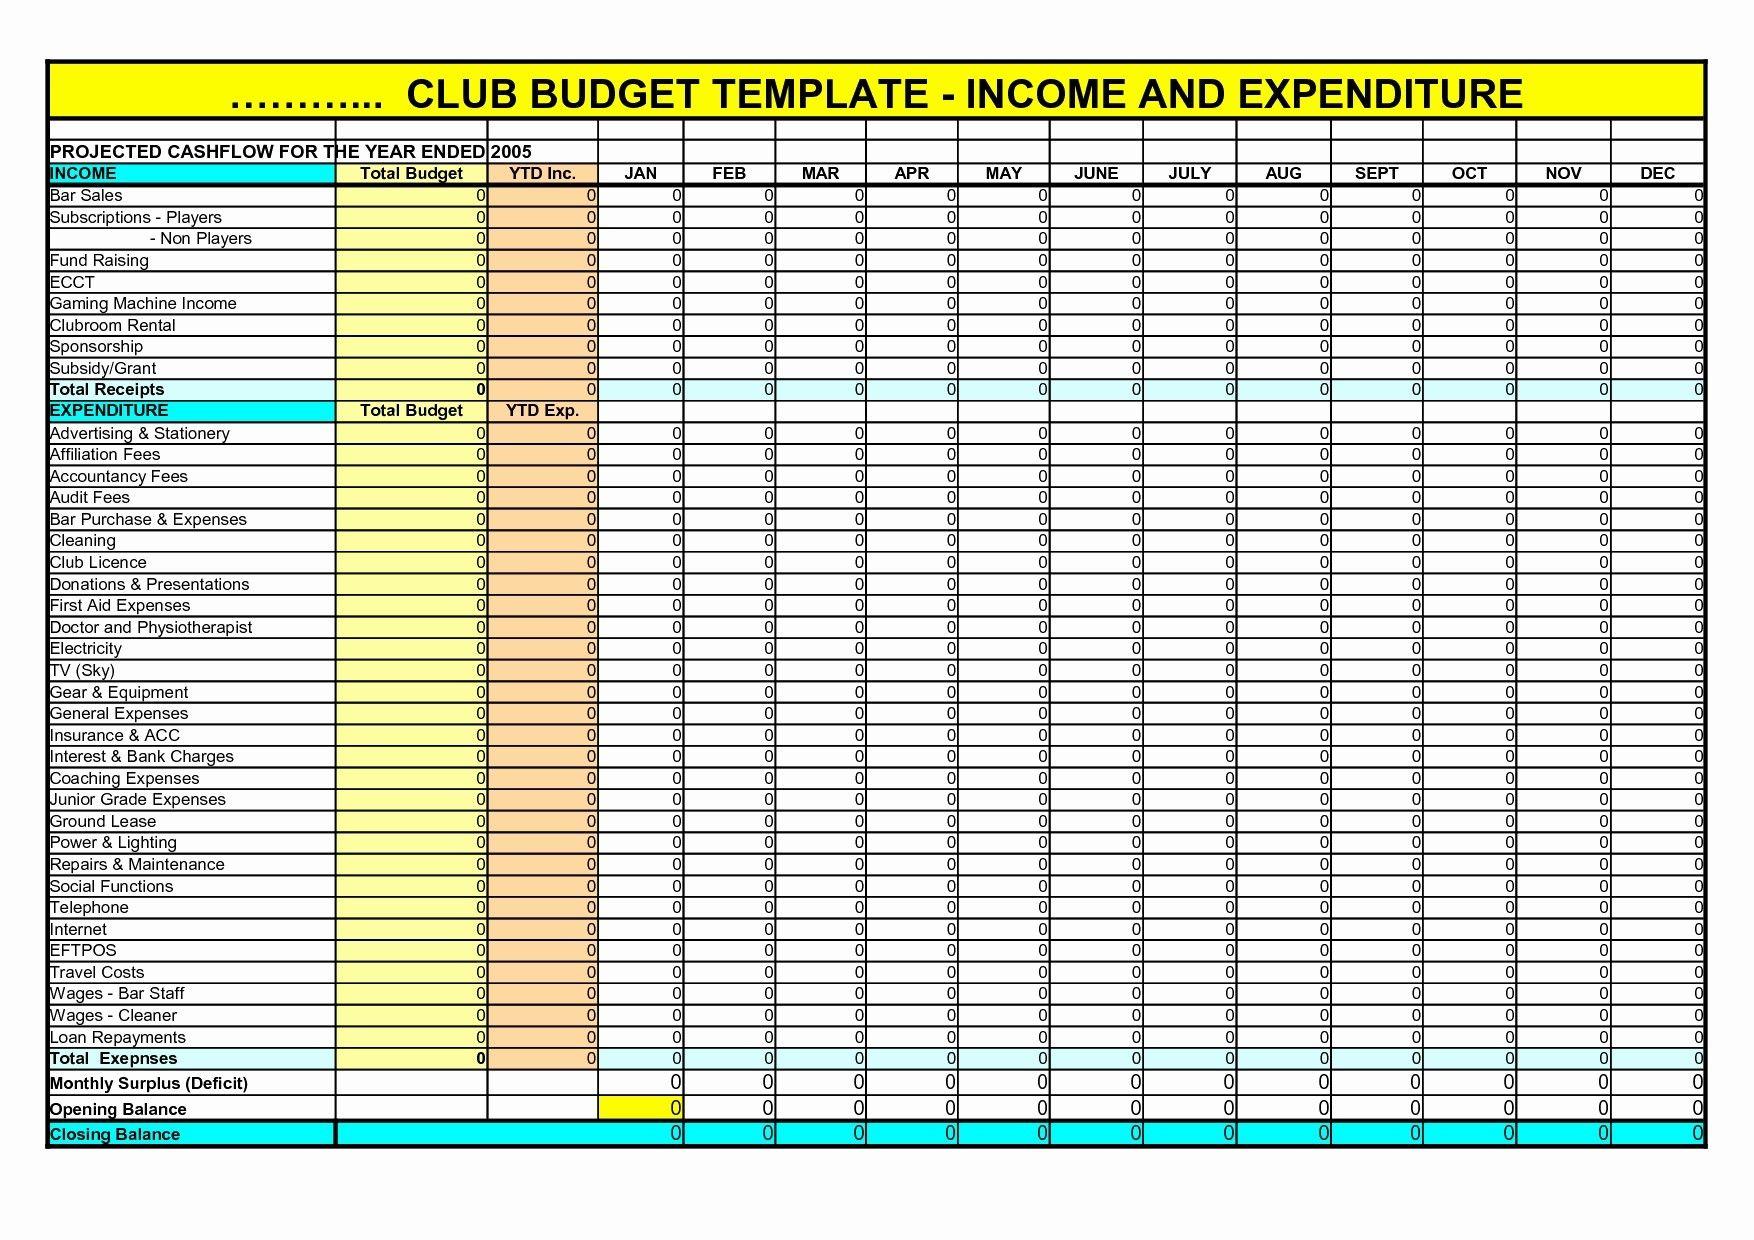 New Expenses Excel Exceltemplate Xls Xlstemplate Xlsformat